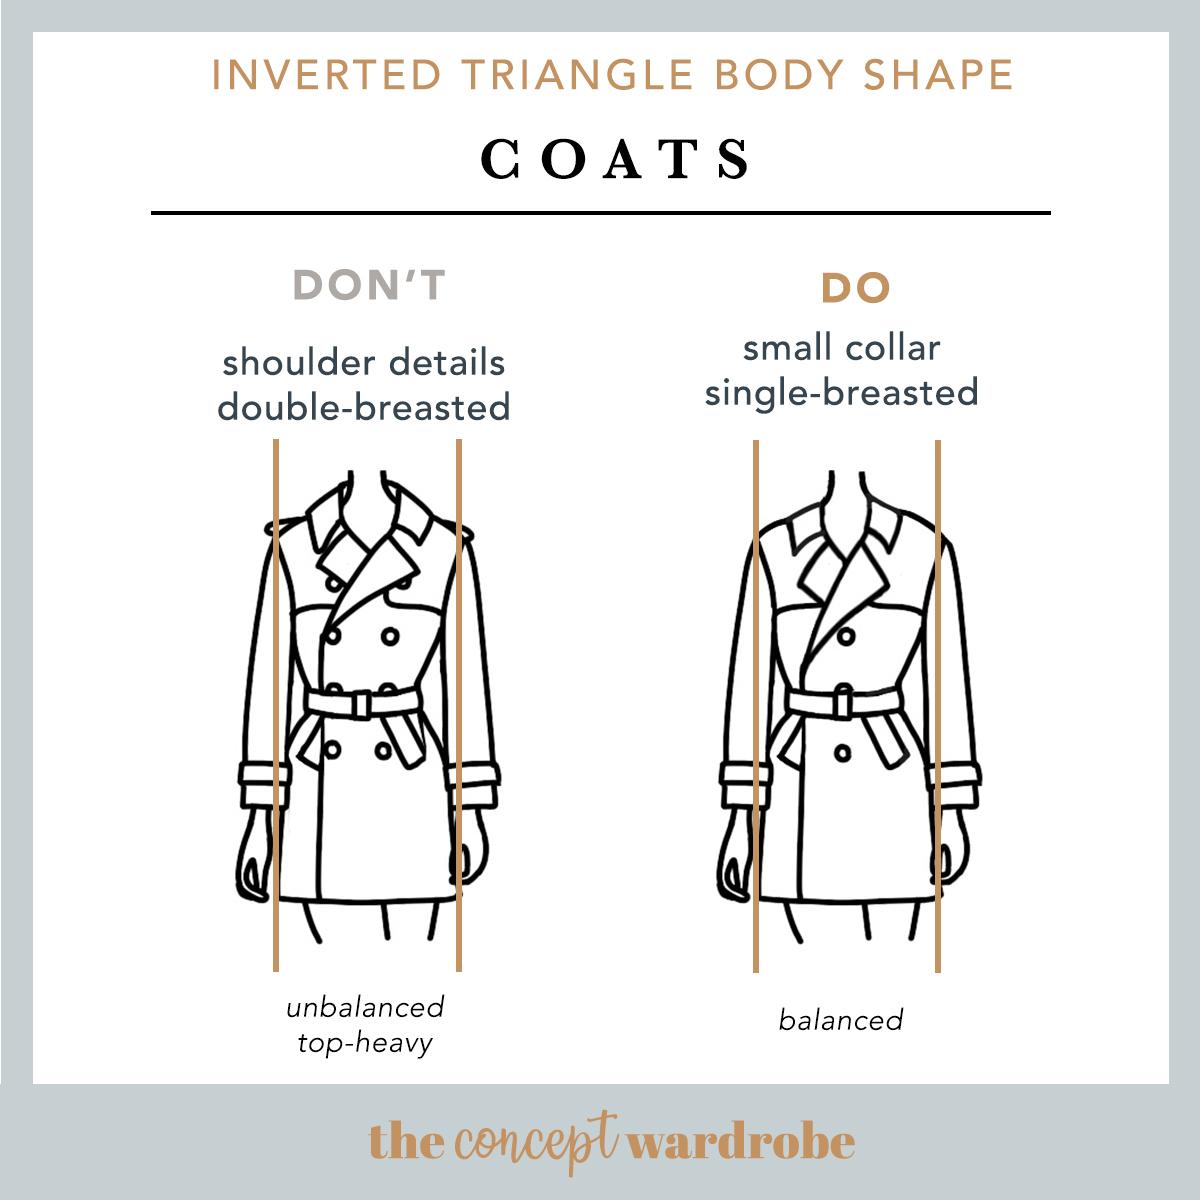 Inverted Triangle Body Shape Coats Do's and Don'ts - the concept wardrobe